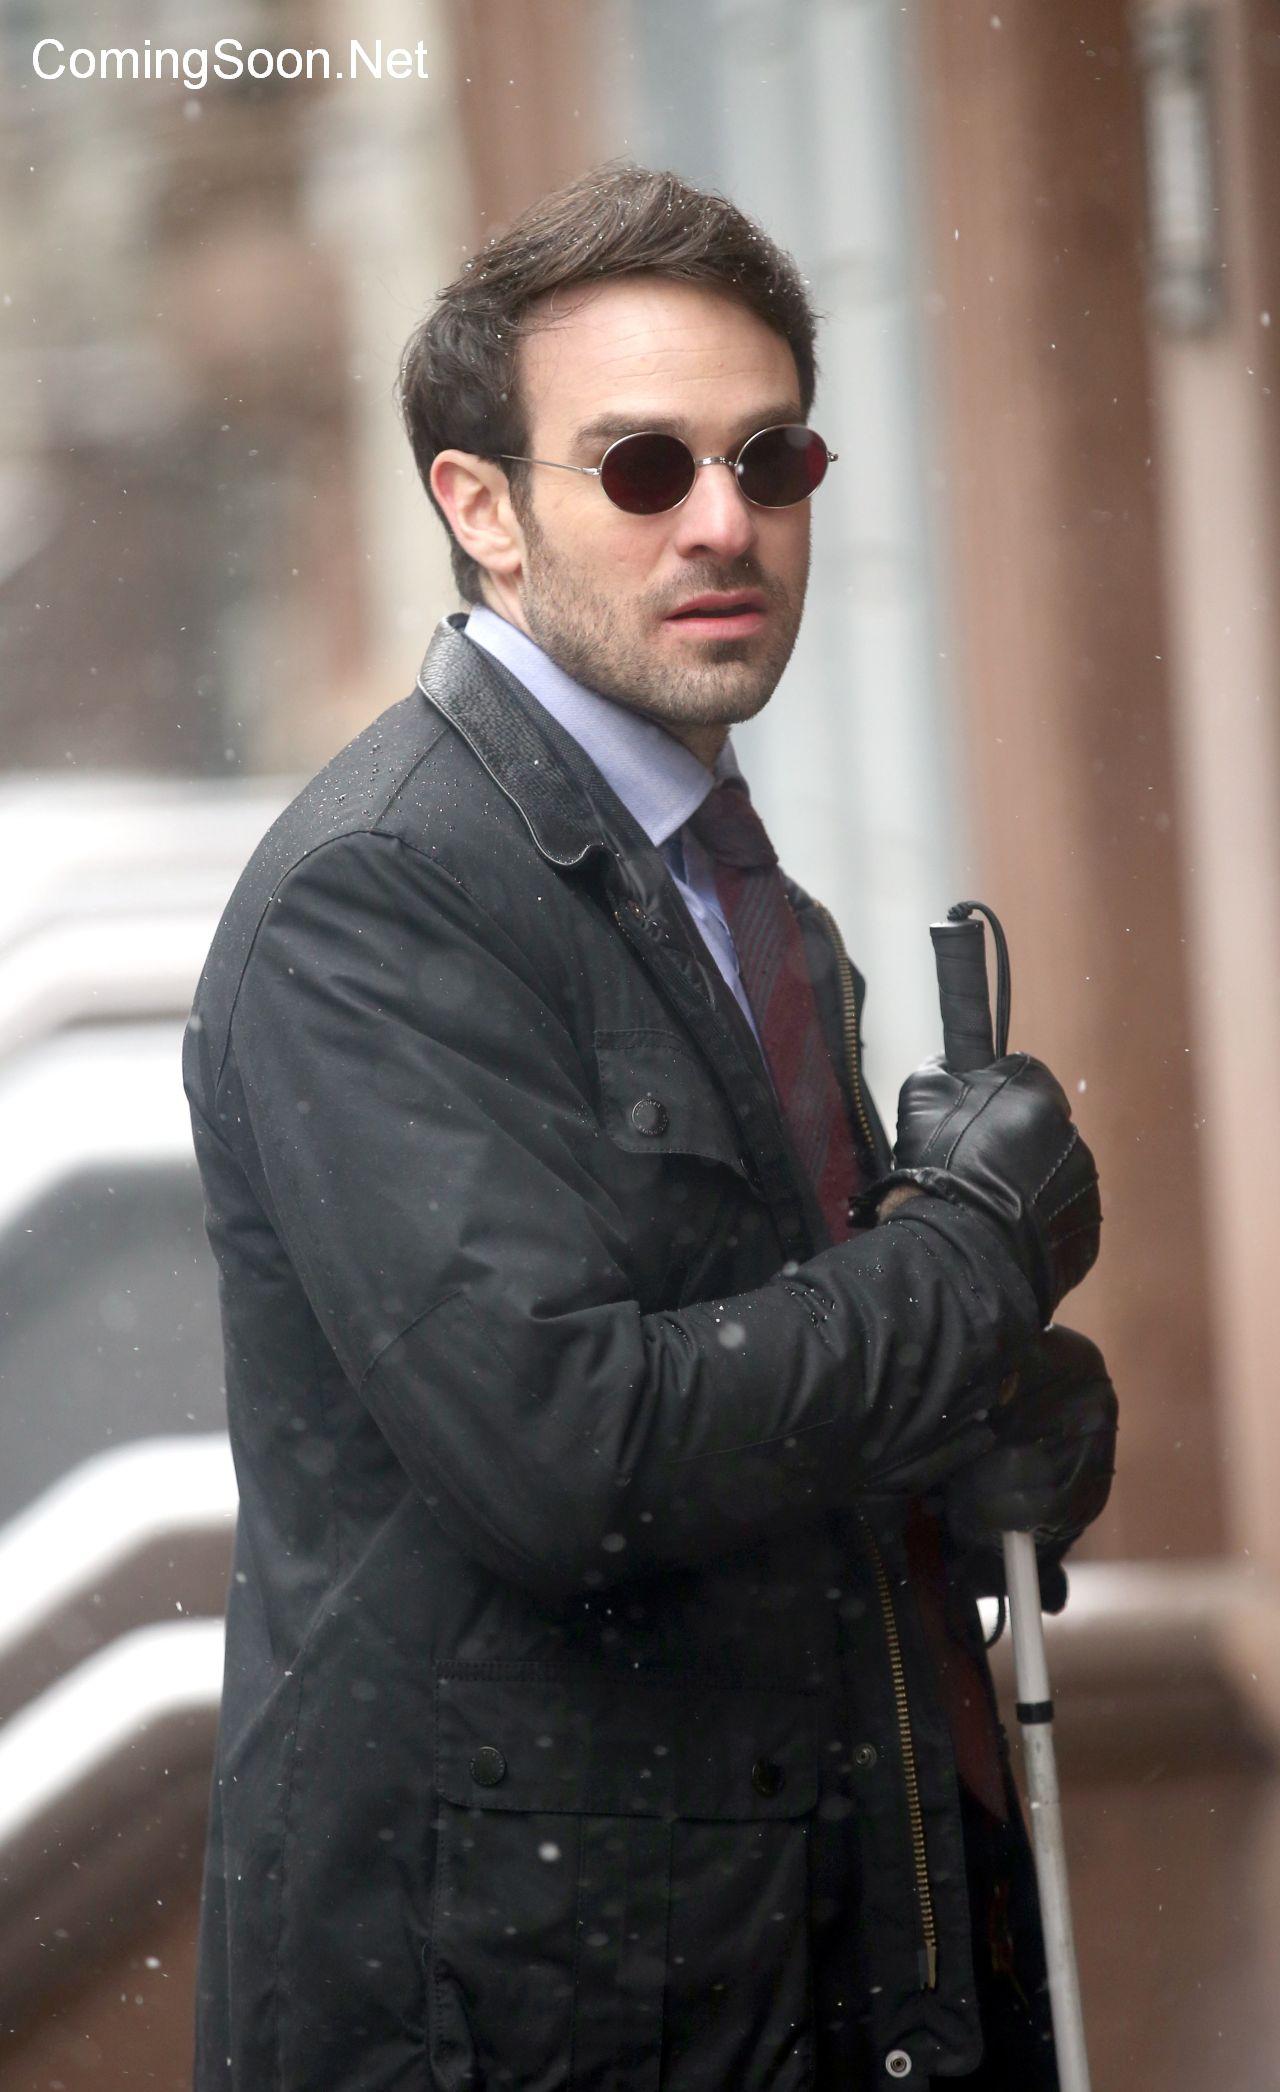 Charlie Cox as Matt Murdock (Marvel's The Defenders)